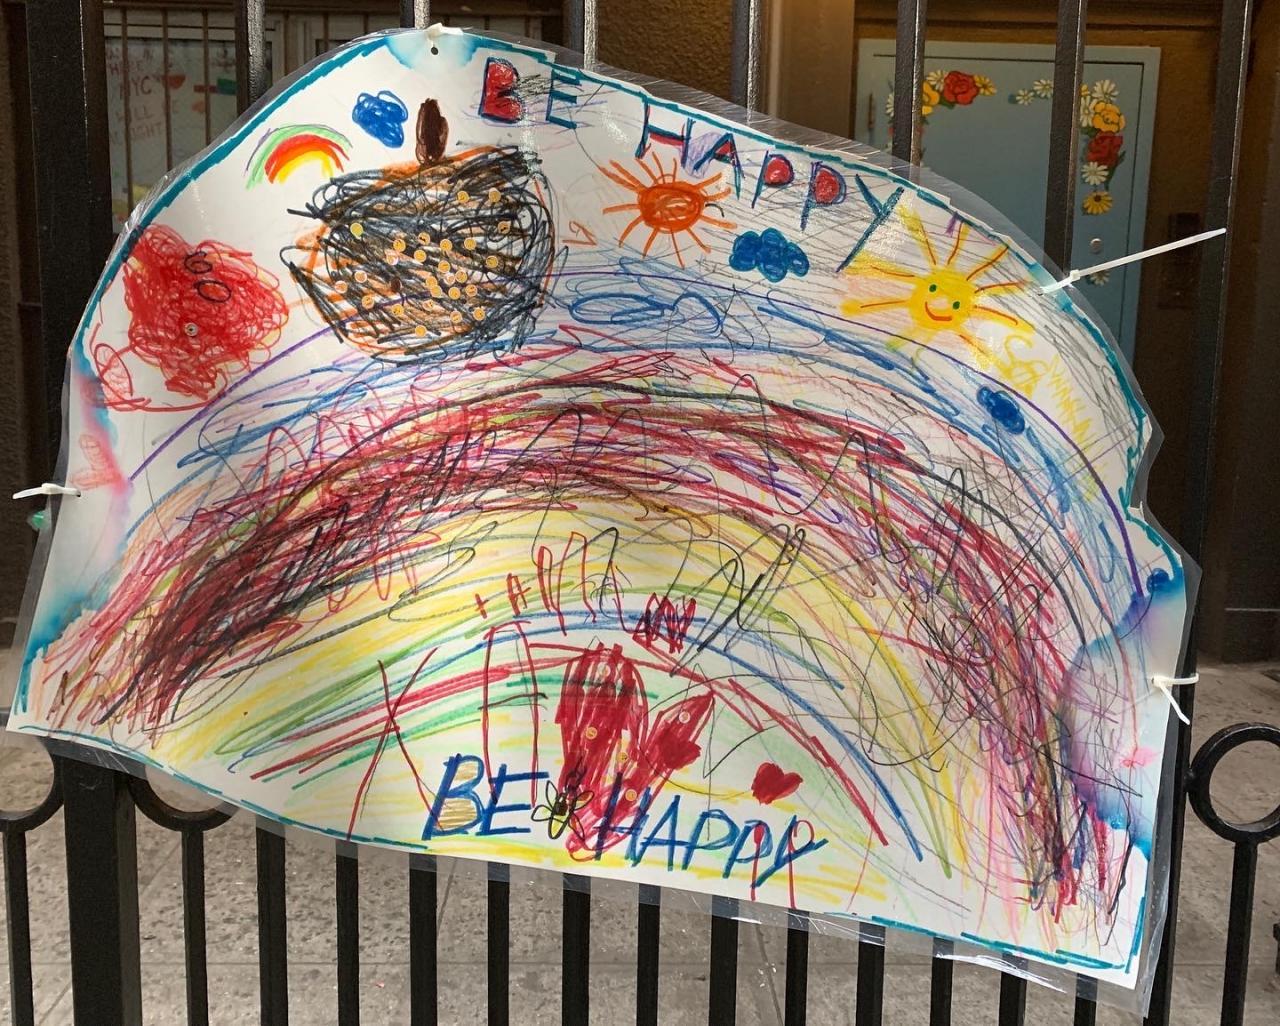 Drawingby children of the Beginnings Nursery School by Stuyvesant Square Park